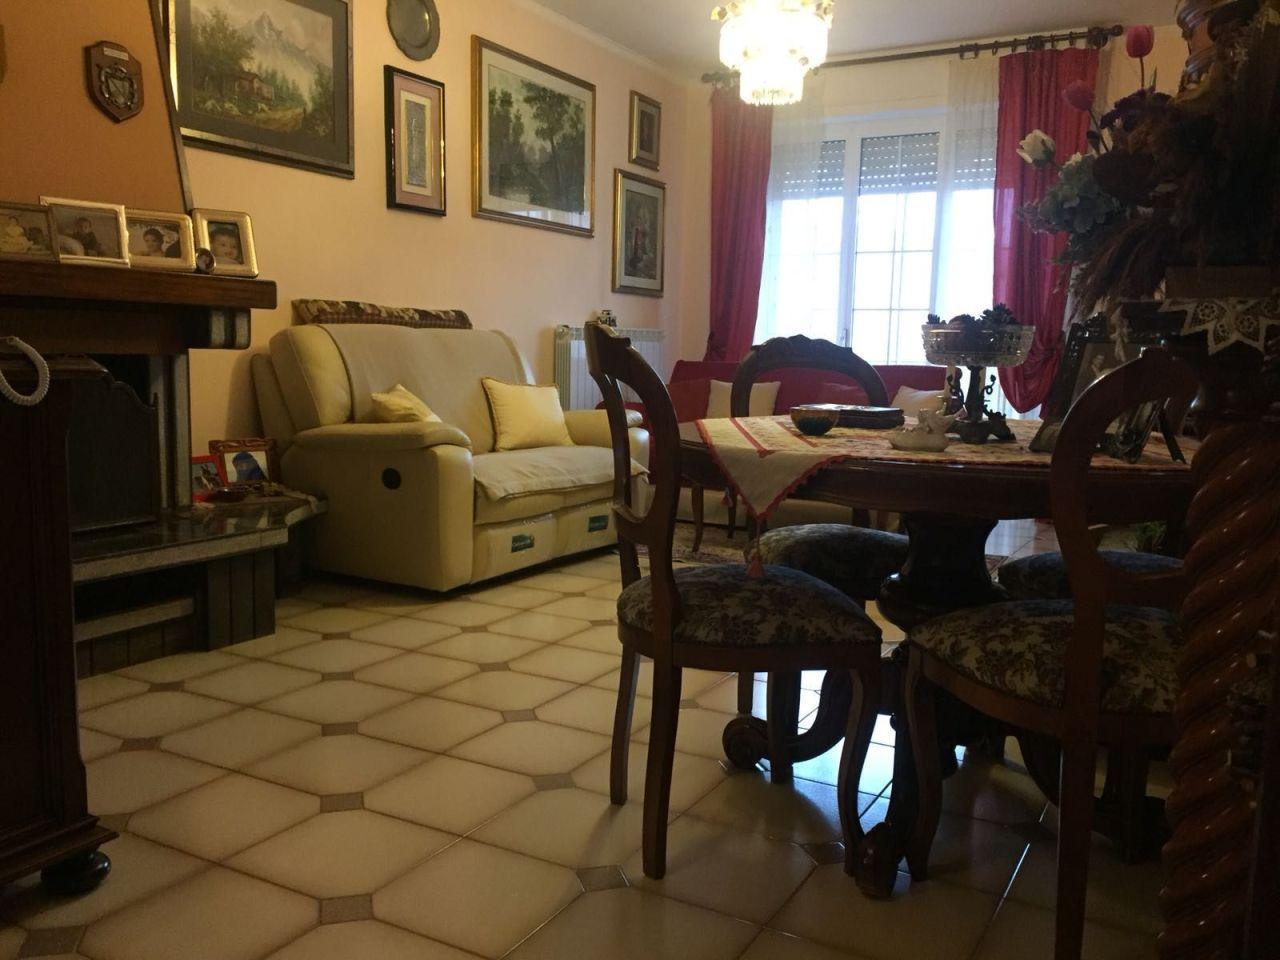 Appartamento - Quadrilocale a Caniparola, Fosdinovo